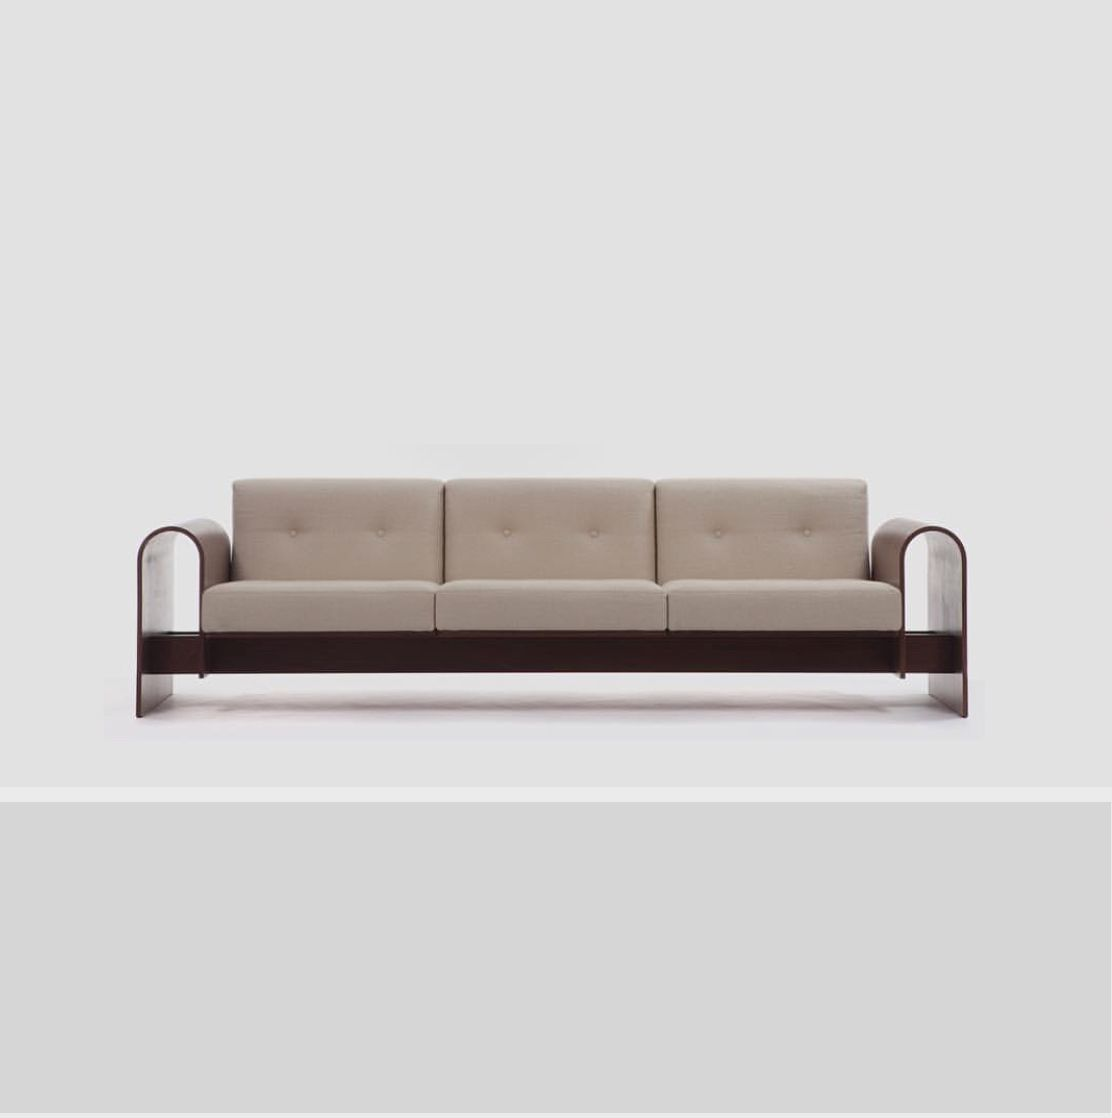 On Sofa By Oscar Niemeyer Available At Espasso Midcentury Modern